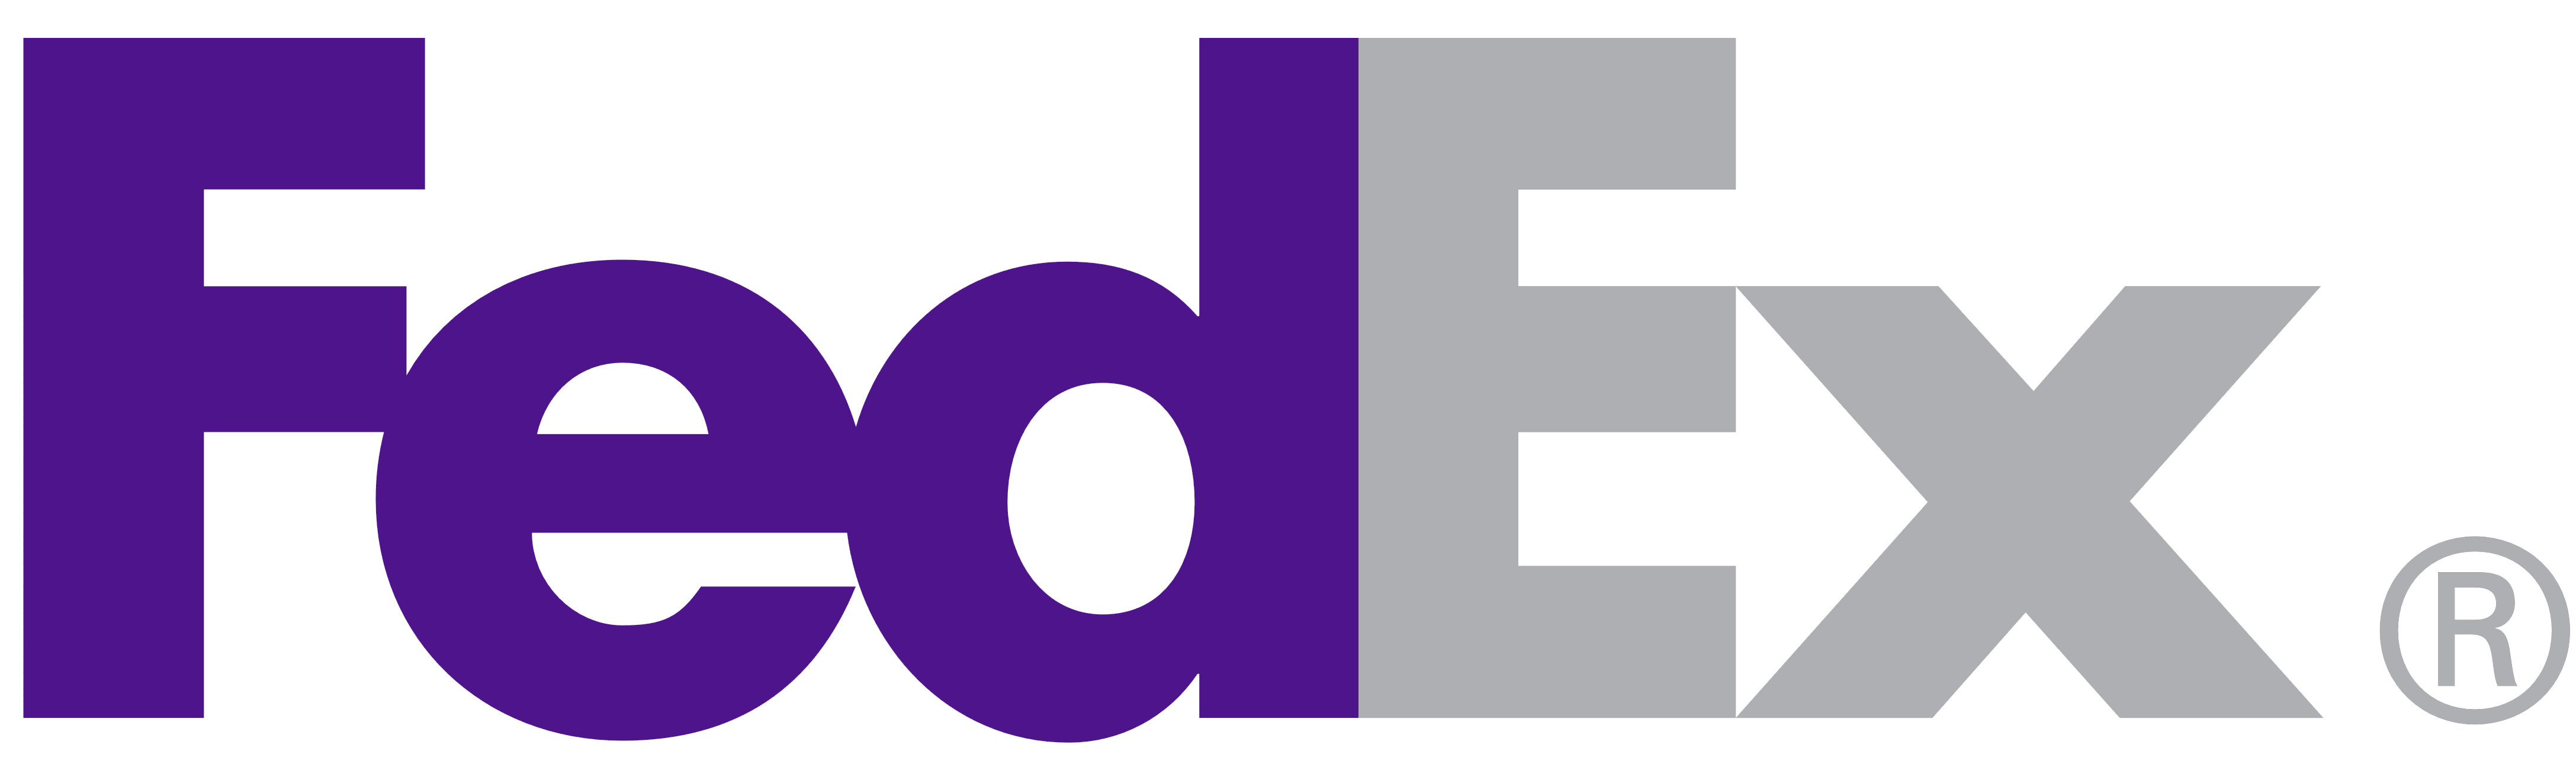 fedex logos download rh logos download com  fedex express login account